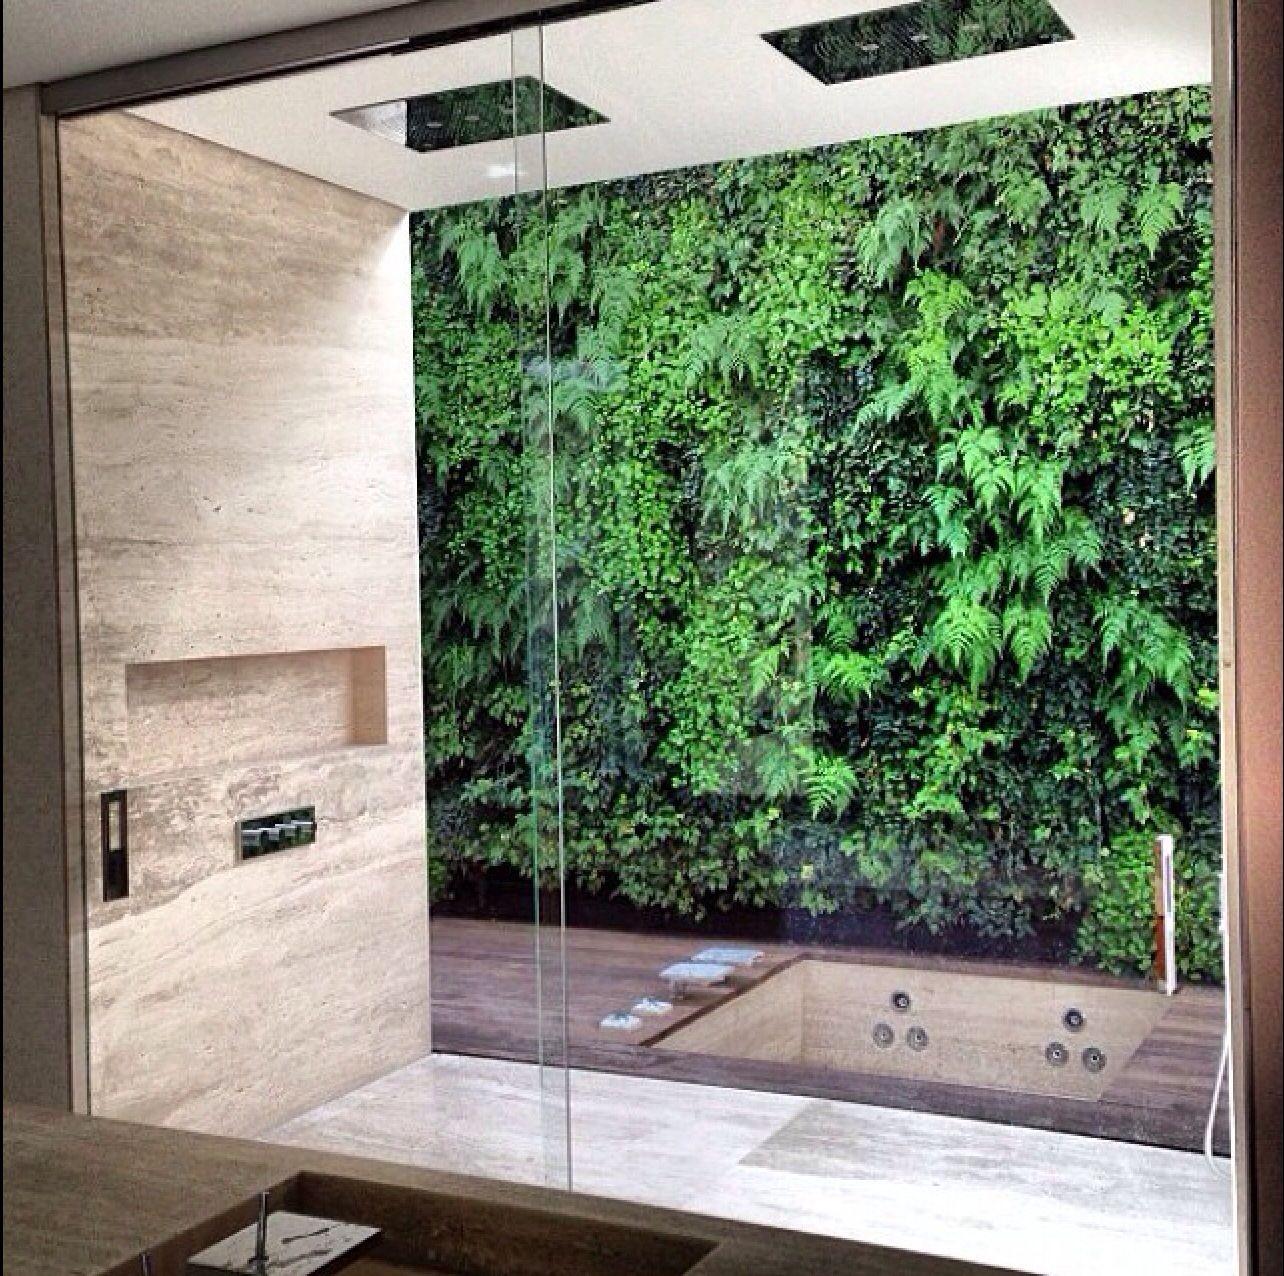 outdoor shower haute guide to residential interiors pinterest badezimmer bad und baden. Black Bedroom Furniture Sets. Home Design Ideas